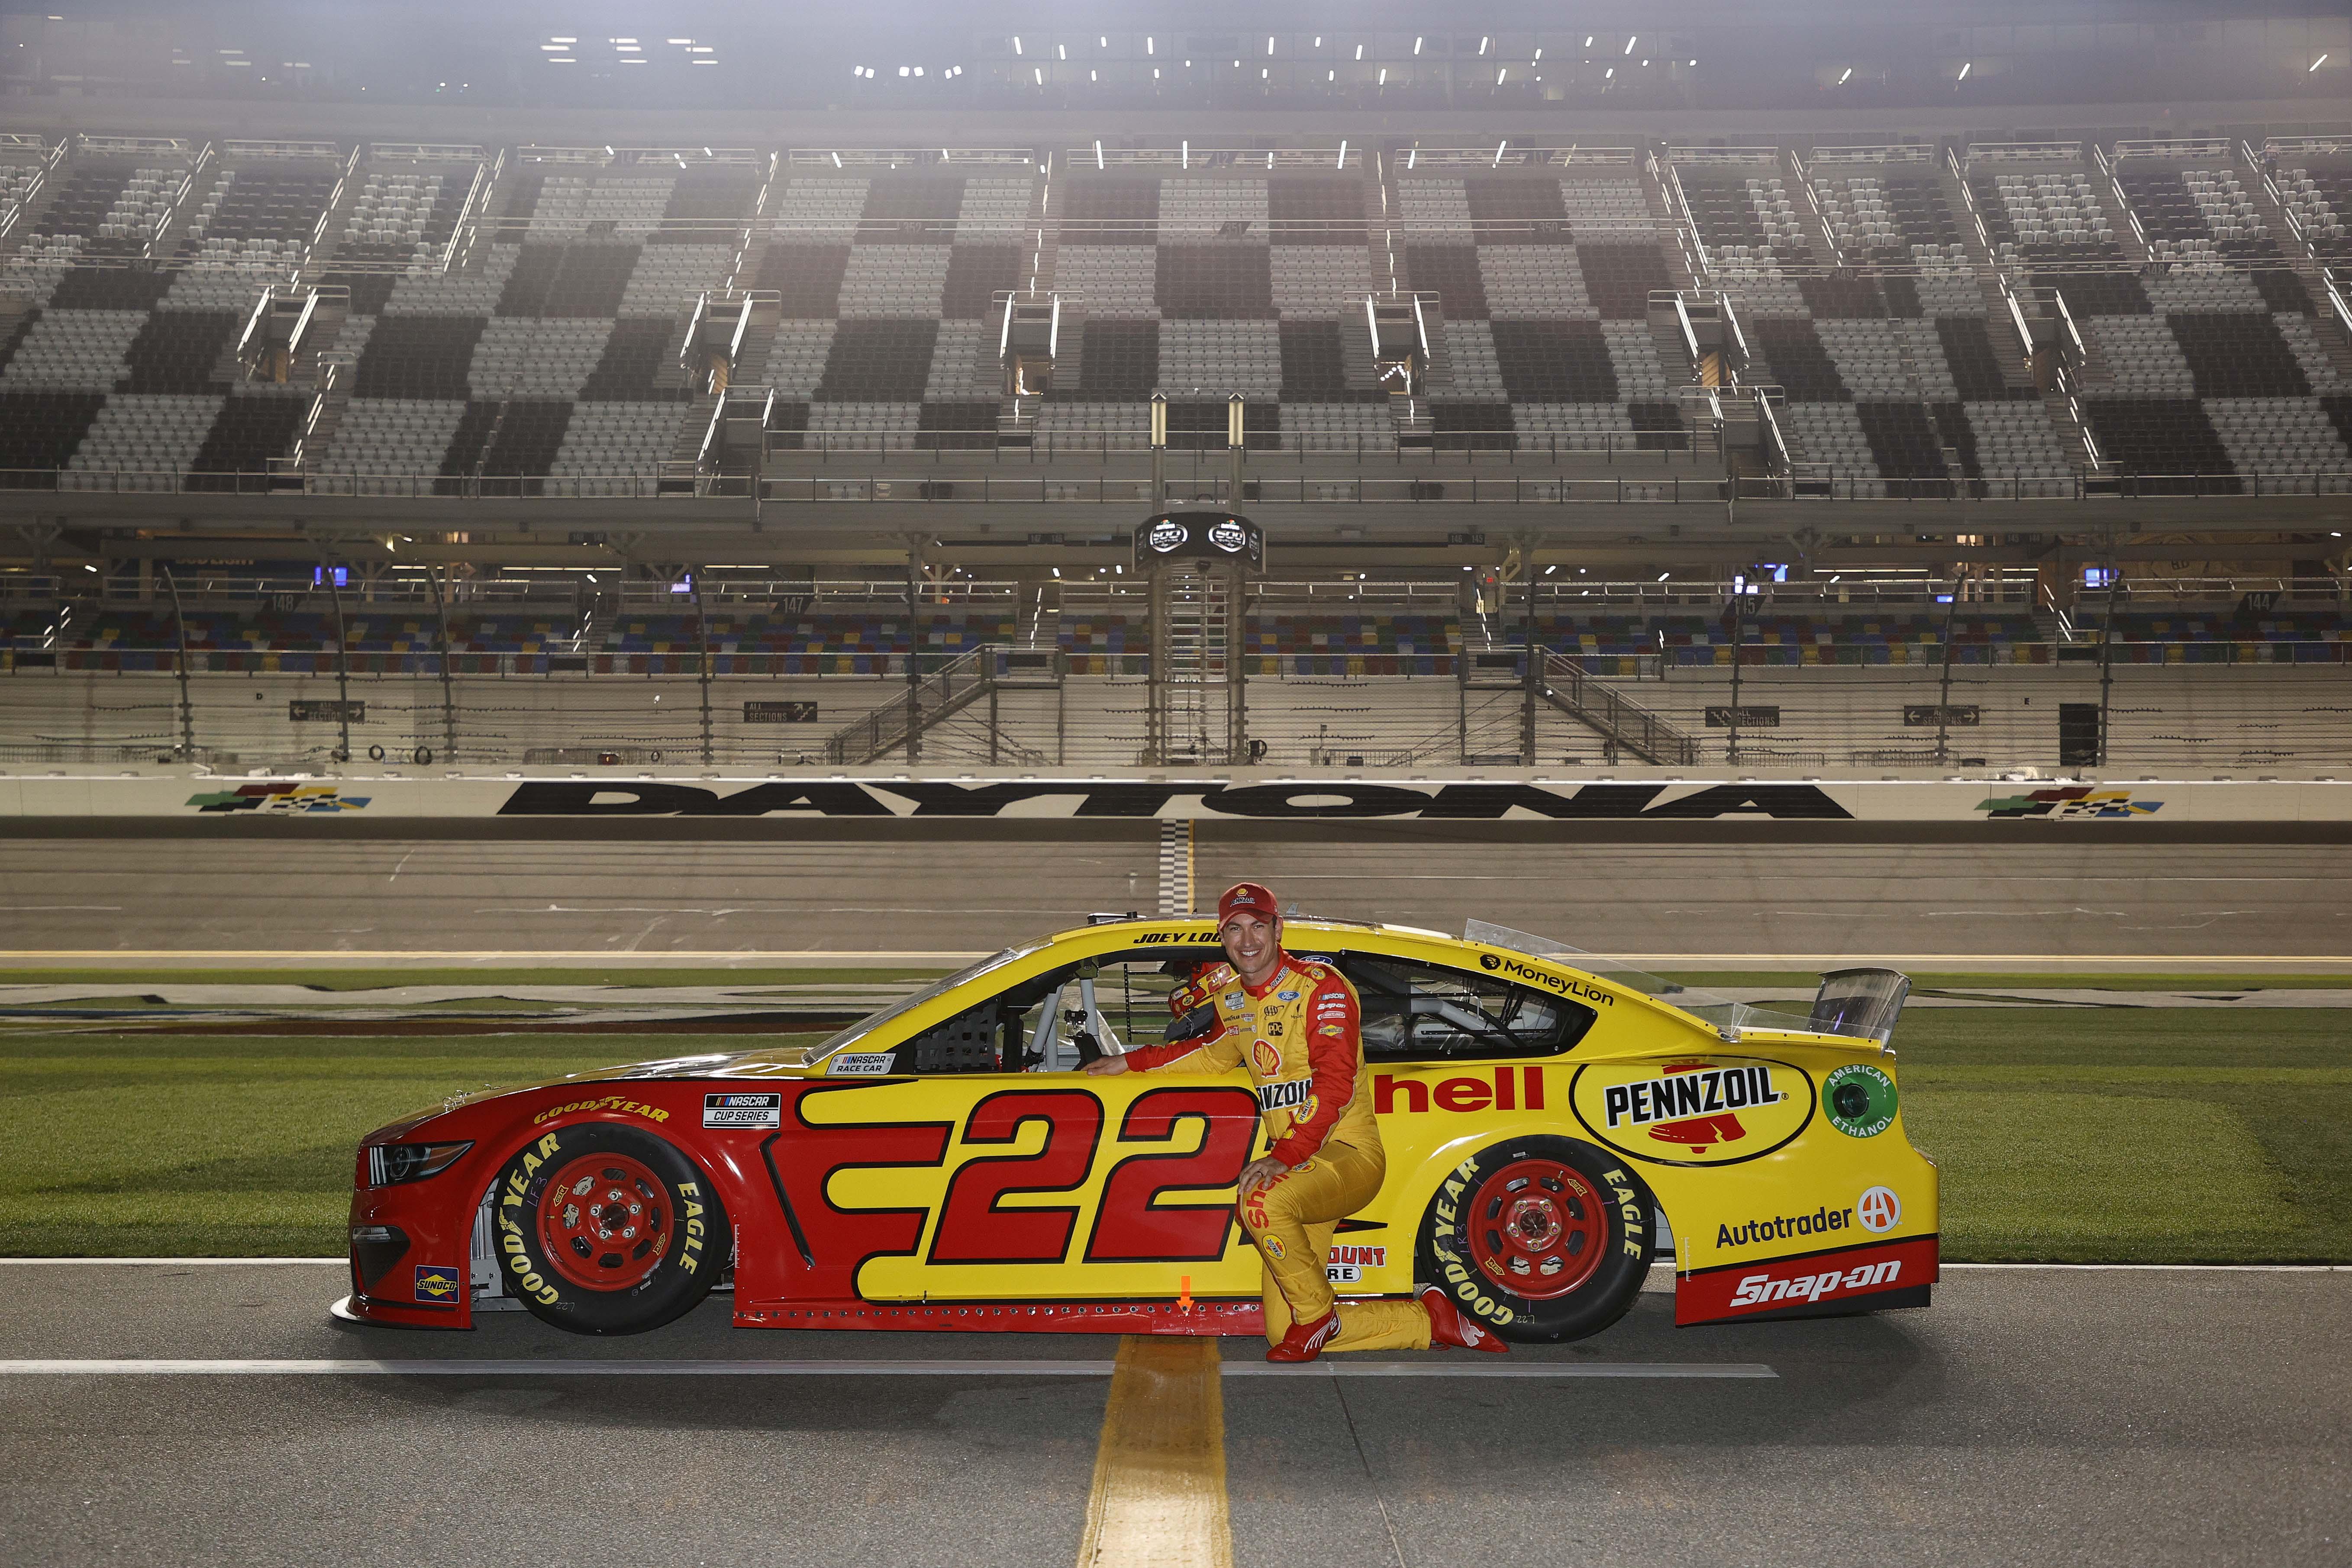 Joey Logano - Daytona International Speedway - NASCAR Cup Series